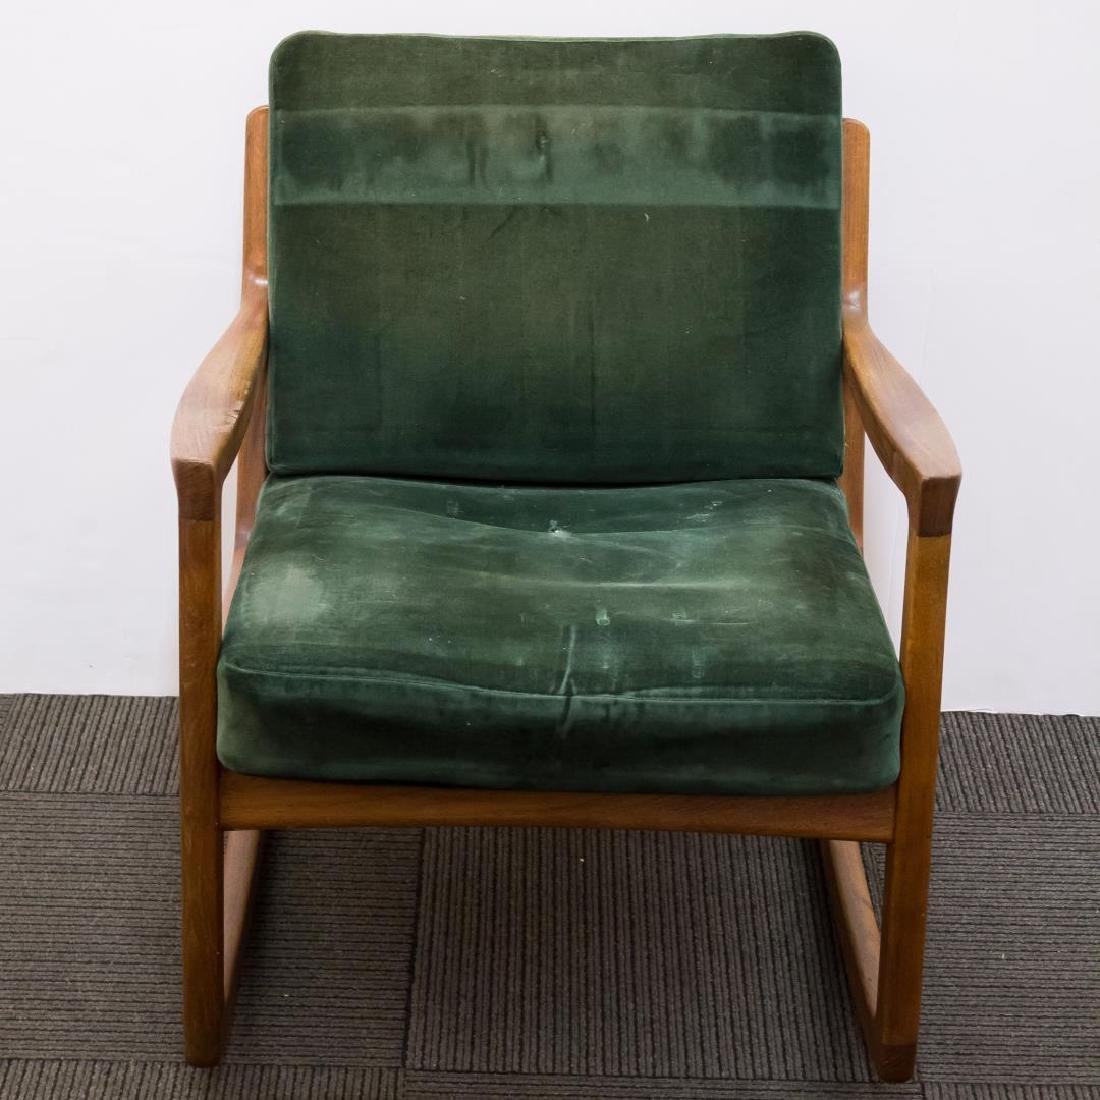 Ole Wanscher Danish Modern Teakwood Rocking Chair - 2